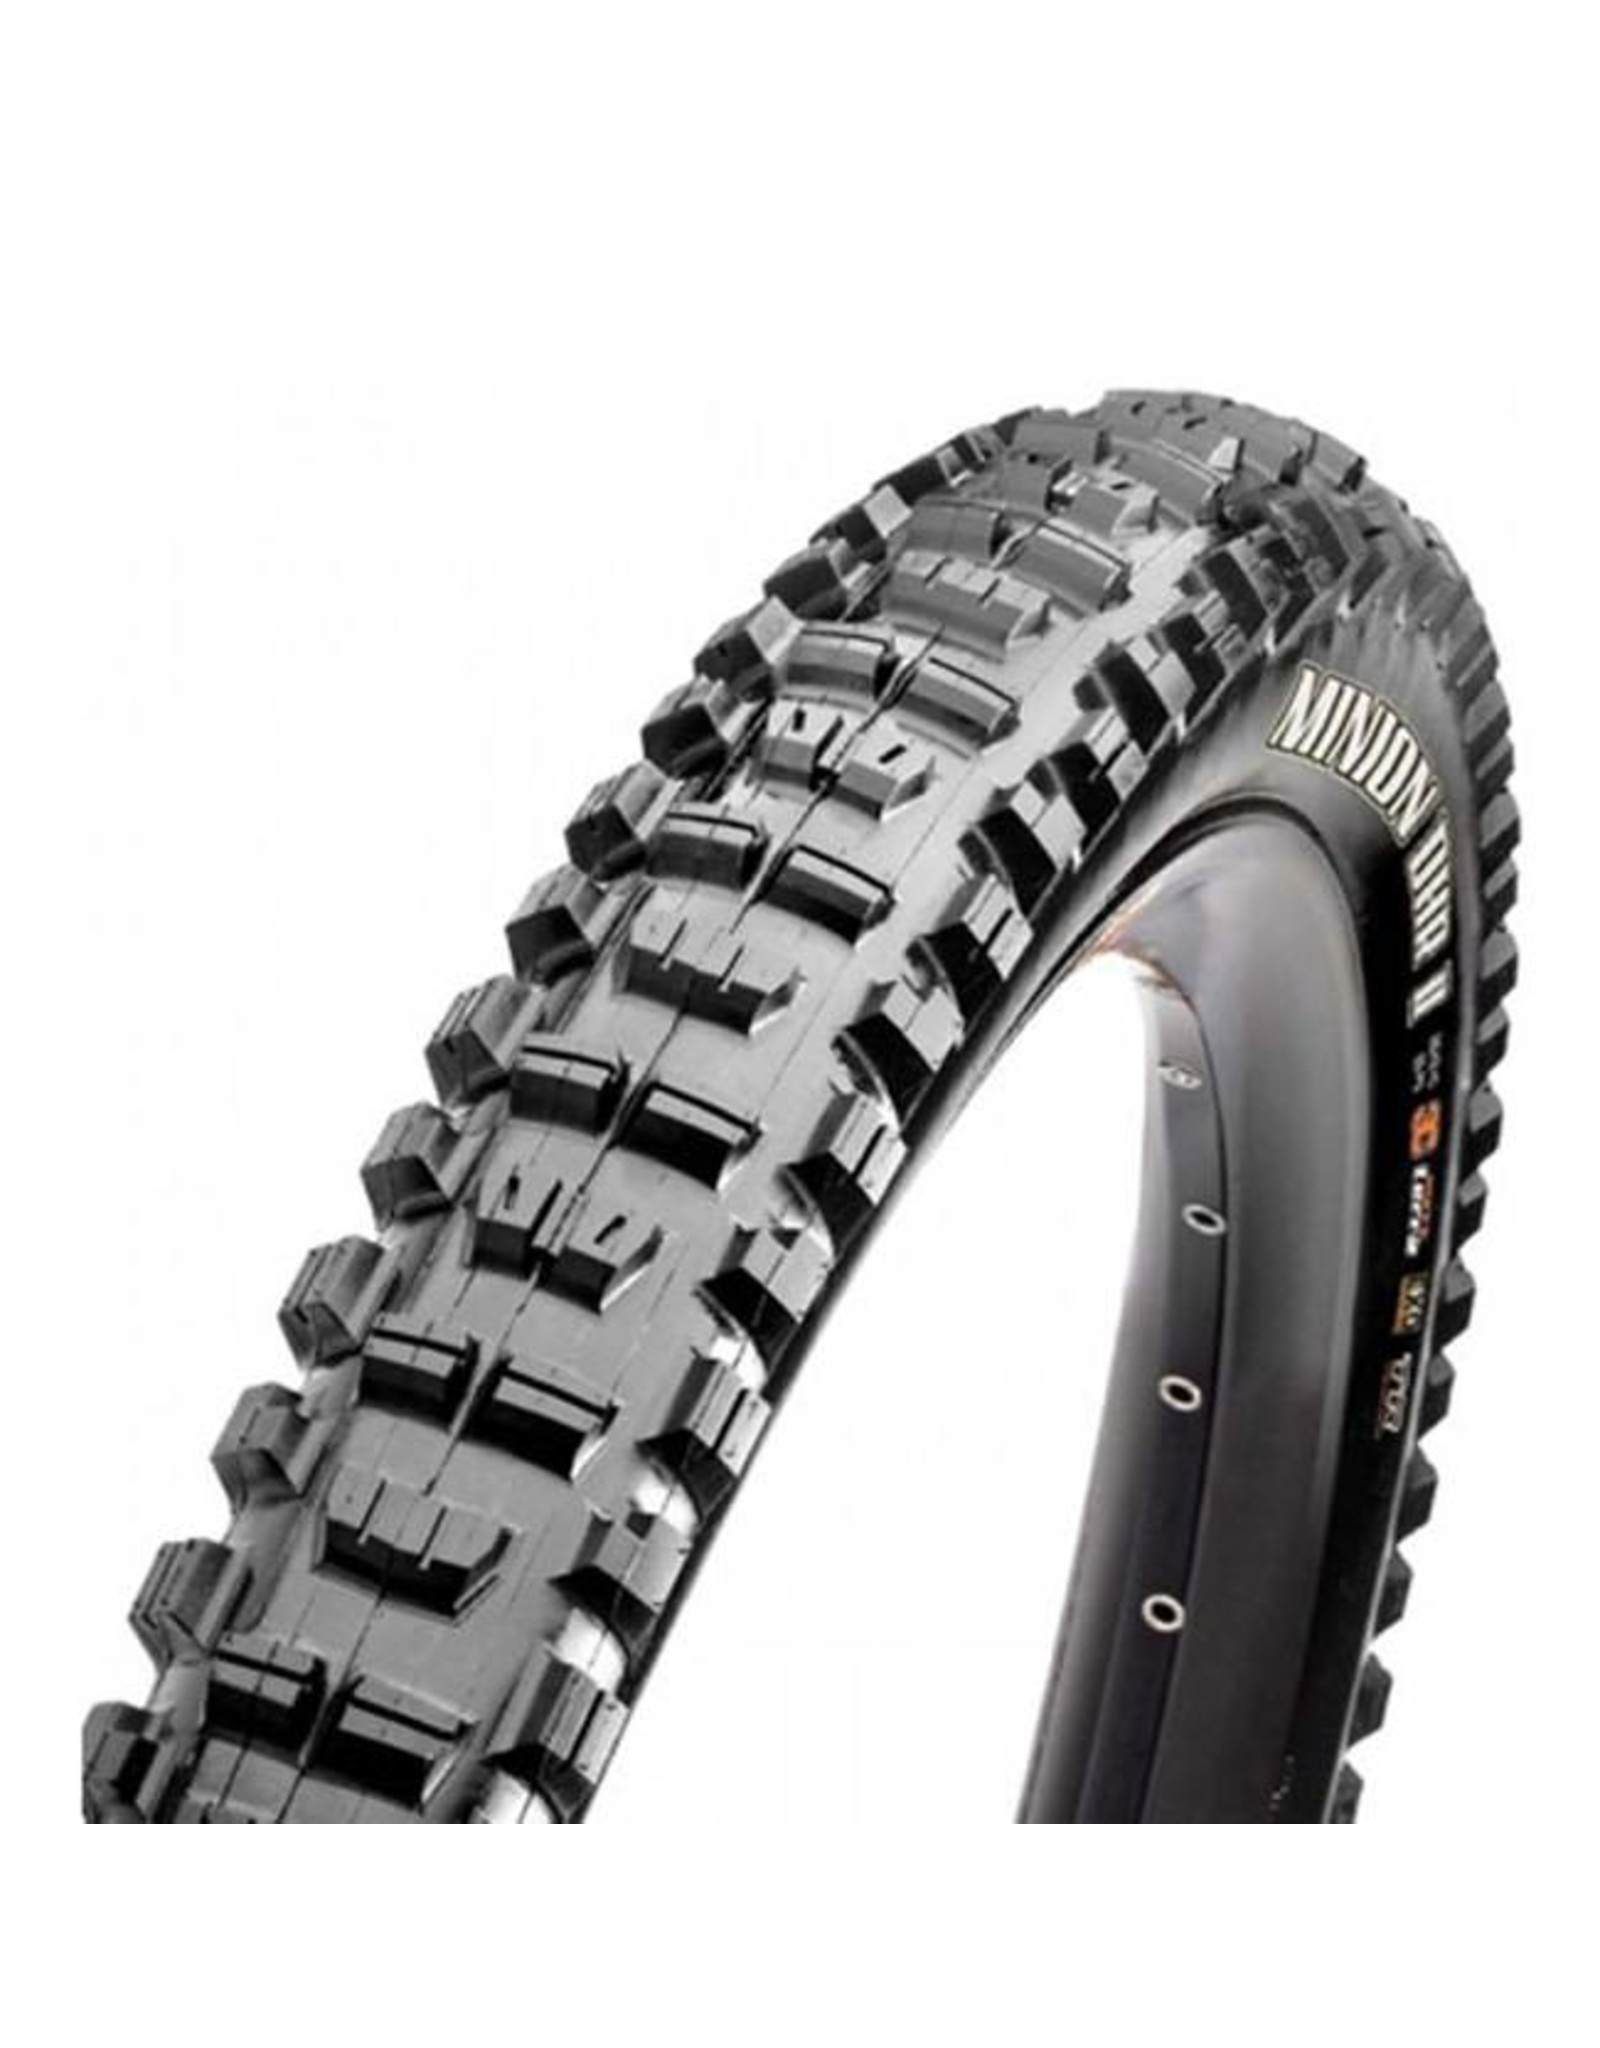 "Maxxis Maxxis Minion DHR II Tire: 27.5 x 2.80"", Folding, 120tpi, 3C MaxxTerra, EXO, Tubeless Ready, Black"